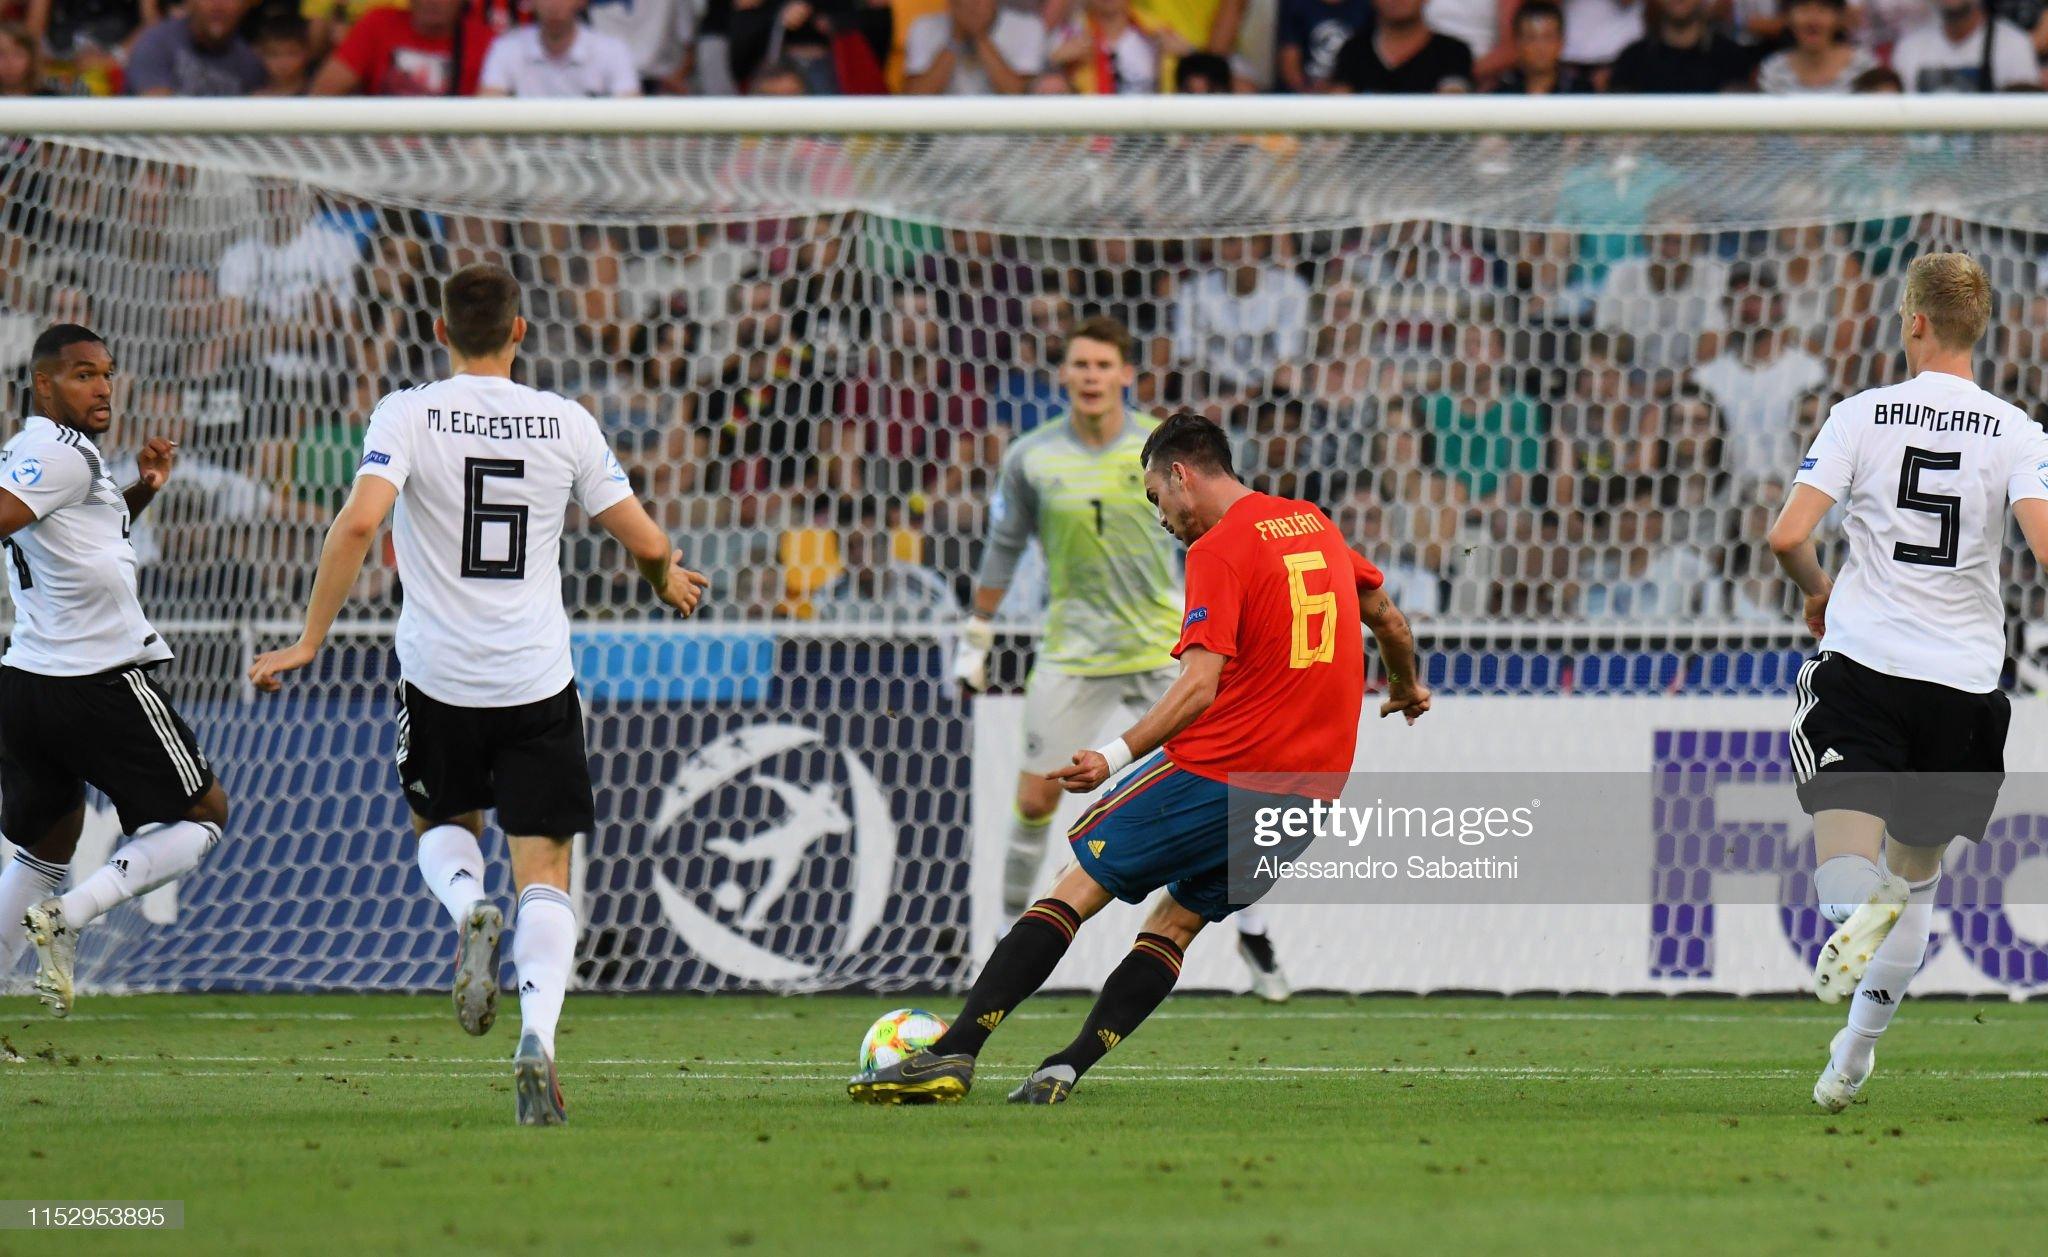 Spain v Germany - 2019 UEFA European Under-21 Championship Final : Fotografia de notícias